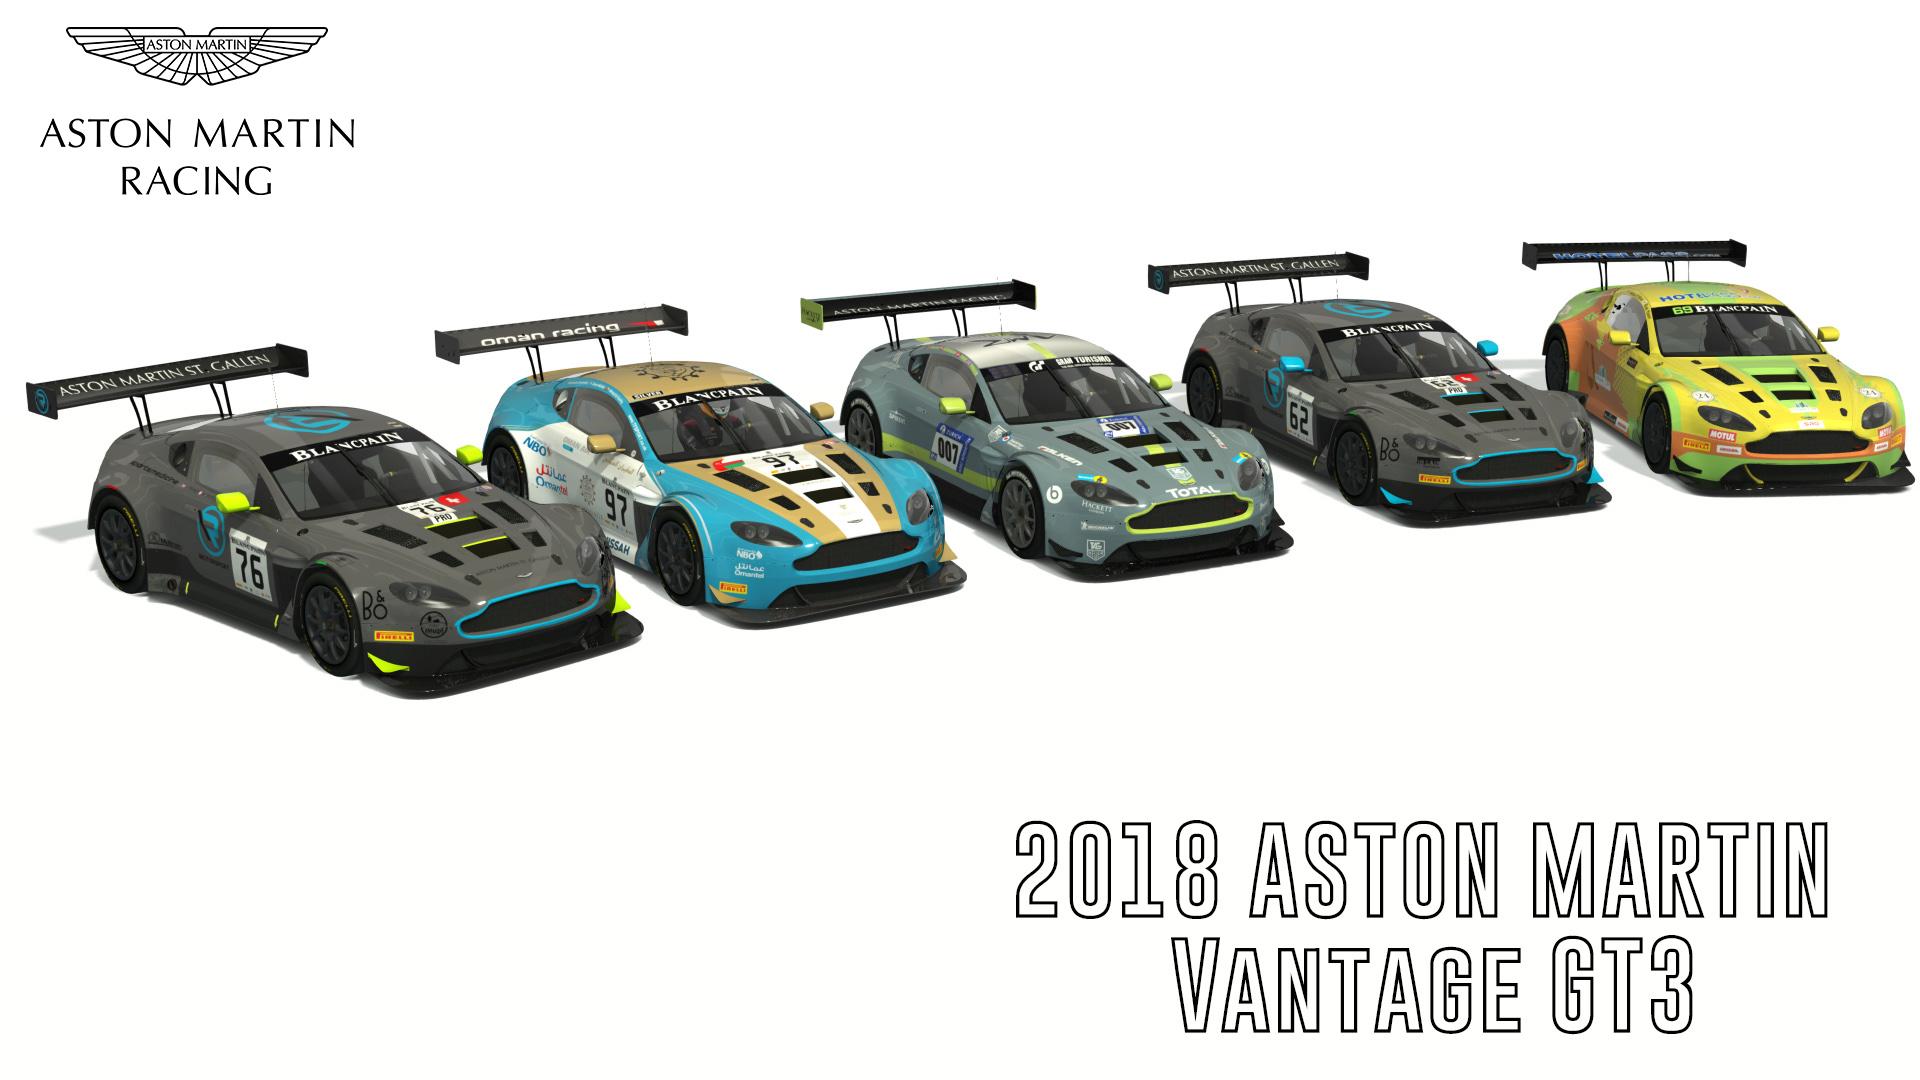 2018 Aston Martin Vantage Gt3 Livery Pack Racedepartment